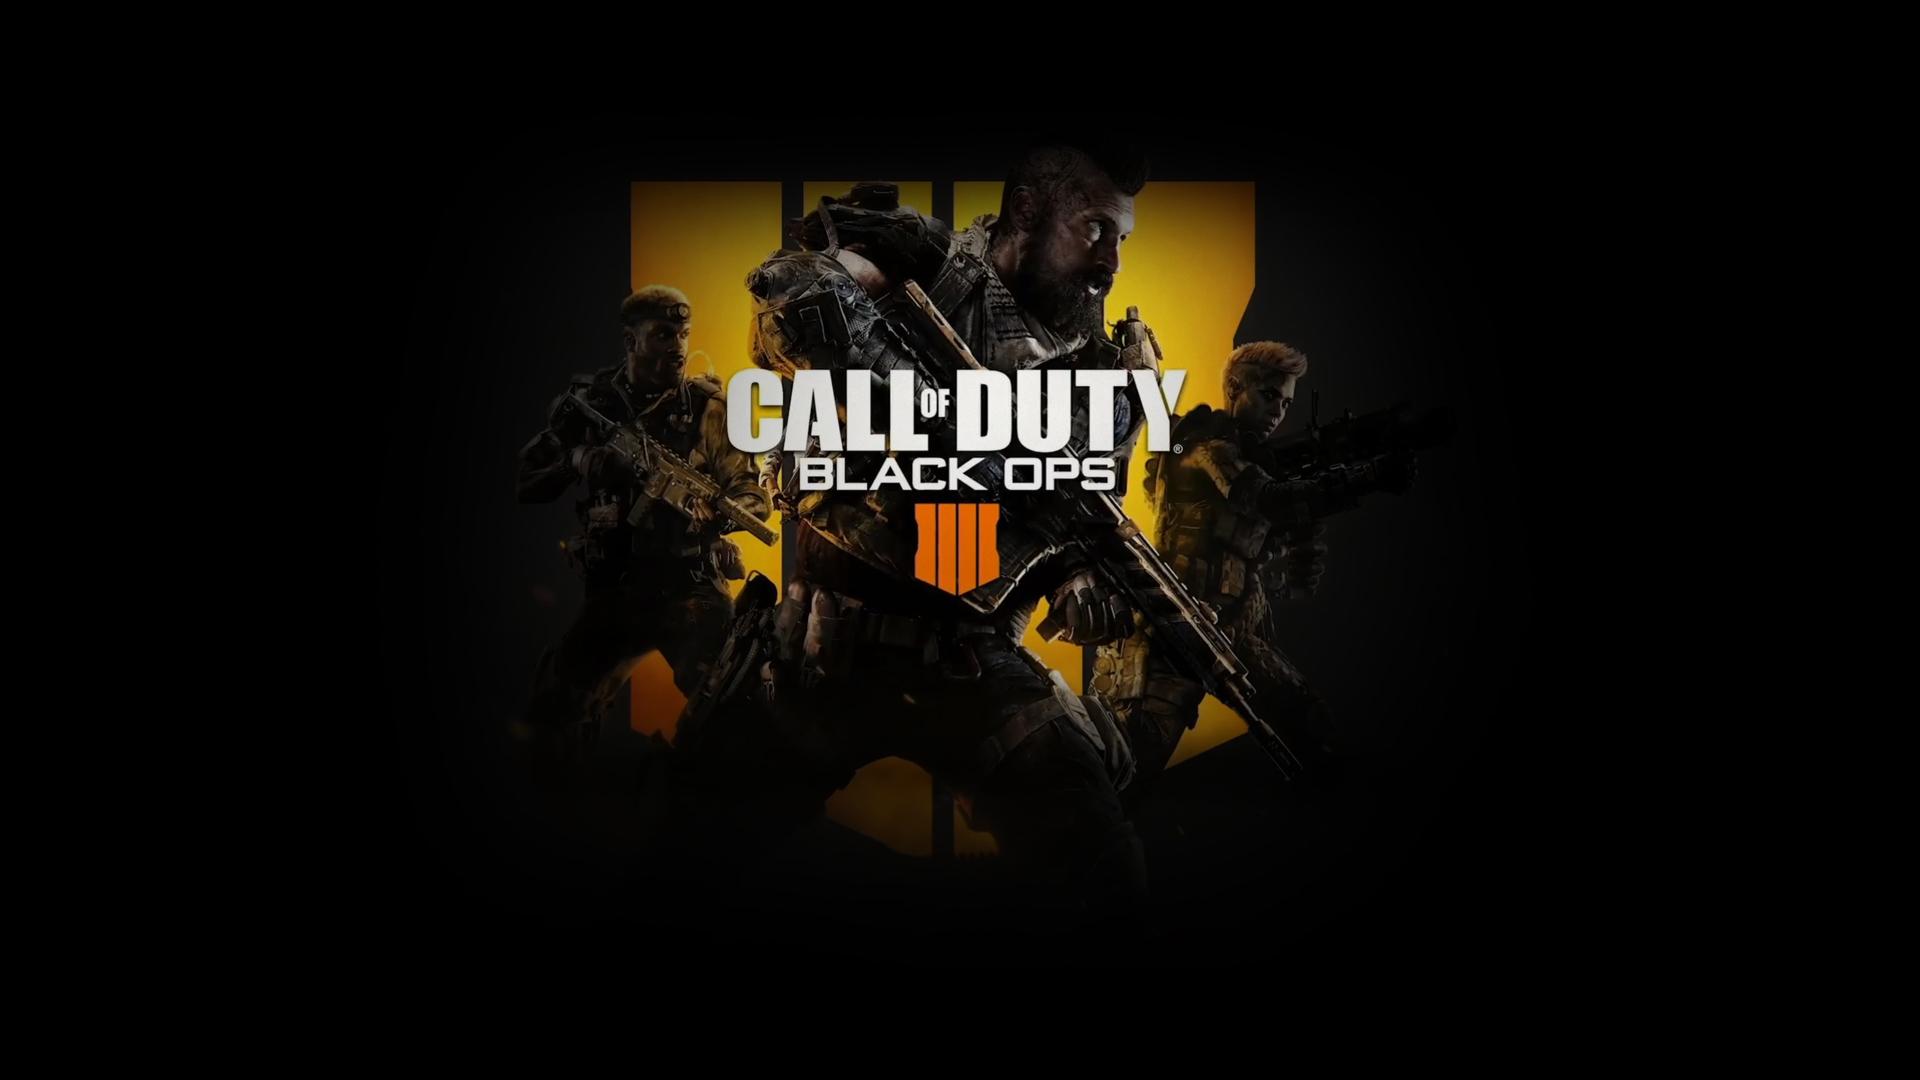 Wallpaper Bo4 Blackops4 Black Ops 4 Treyarch Blackout Call